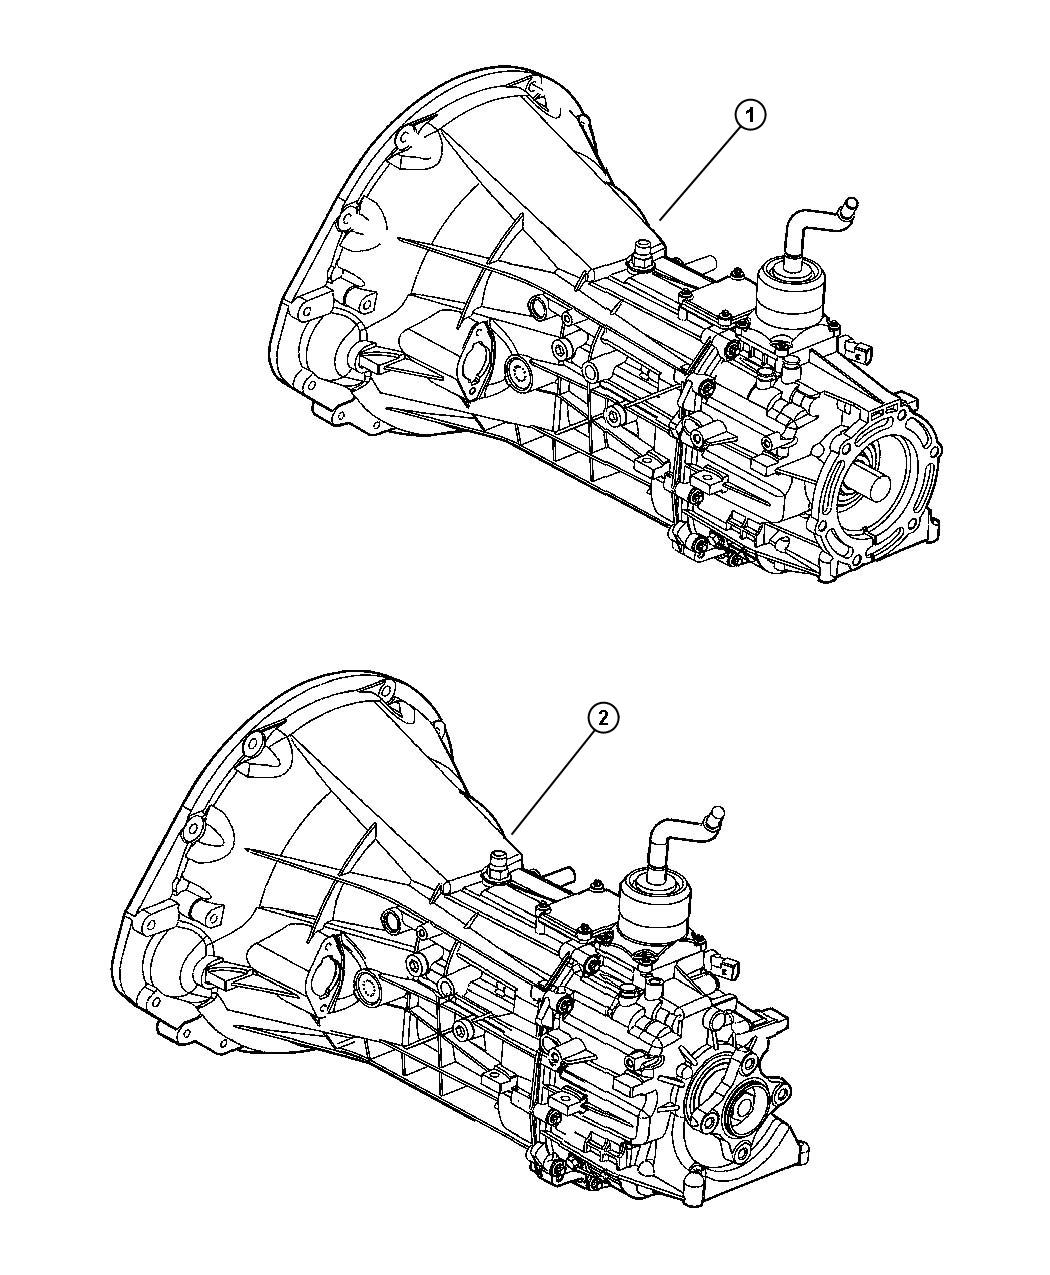 Dodge Dakota Transmission 6 Speed 2wd Assembly Case